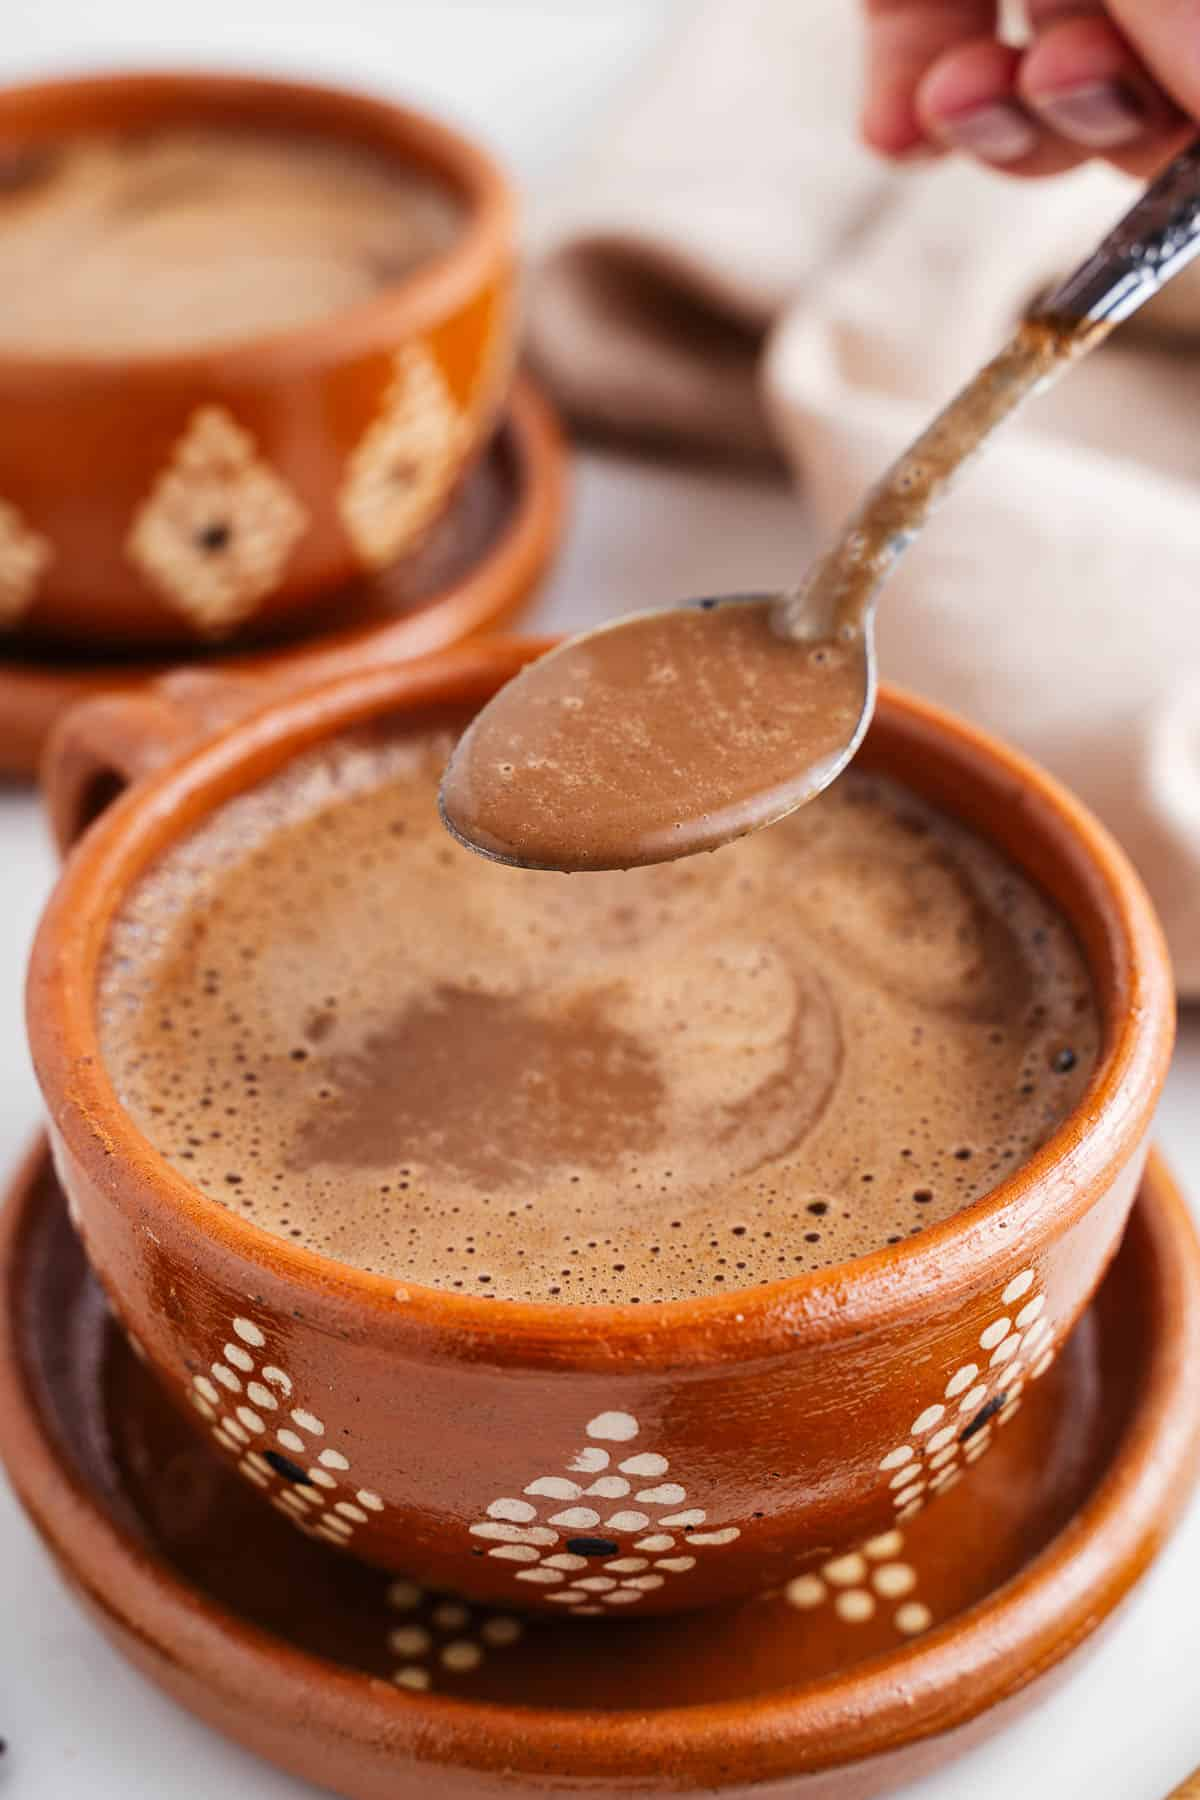 Champurrado on a Spoon Over a Cup